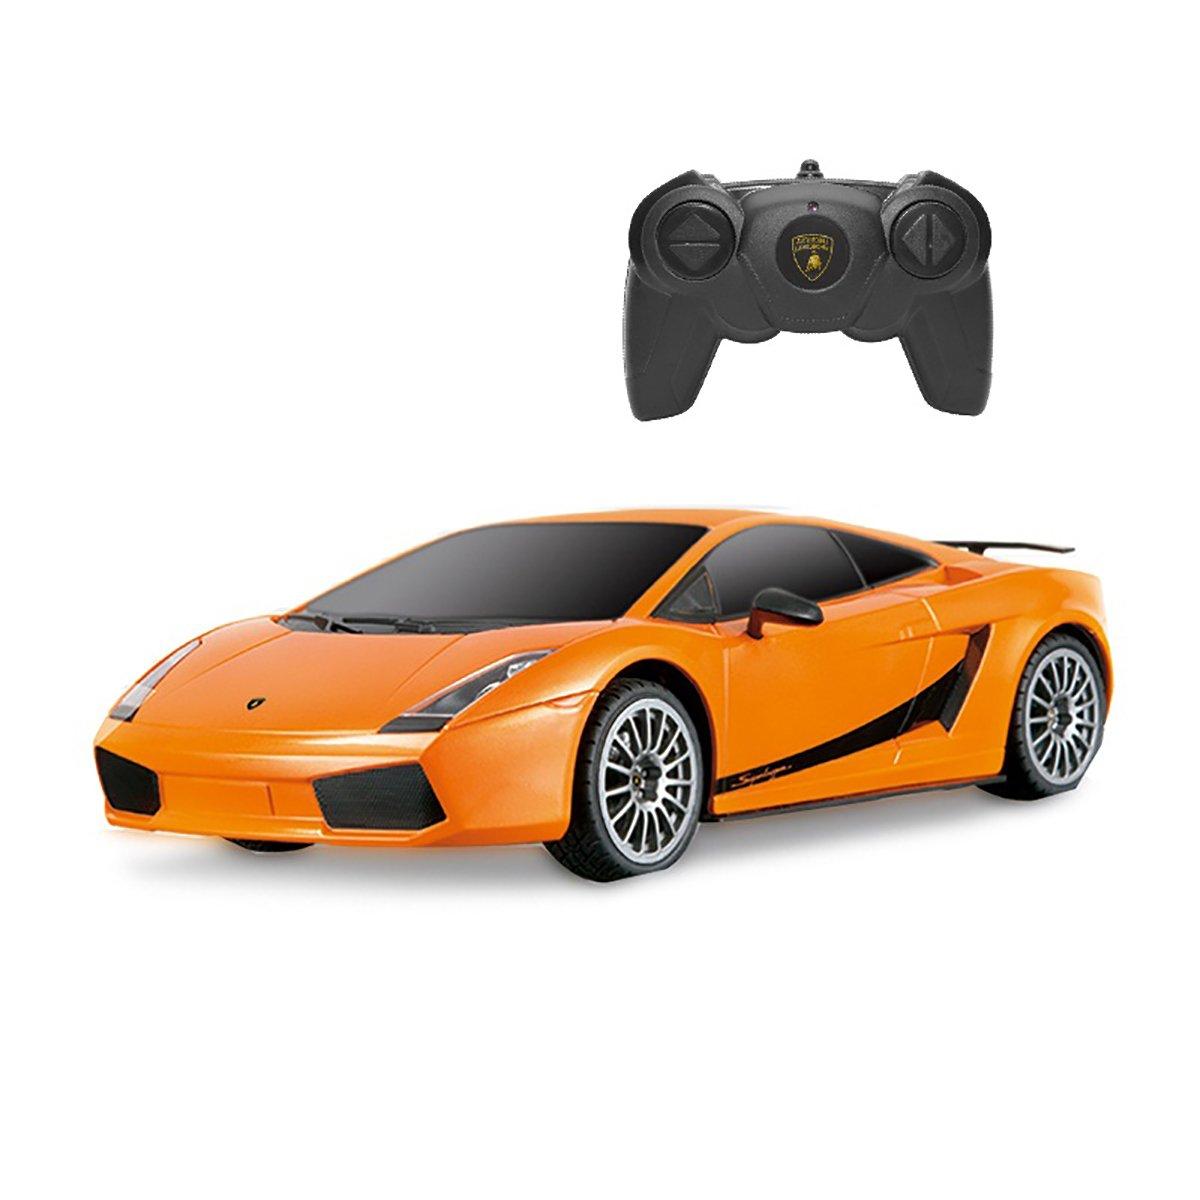 Masinuta cu telecomanda Rastar Lamborghini Superleggera, Portocaliu, 1:24